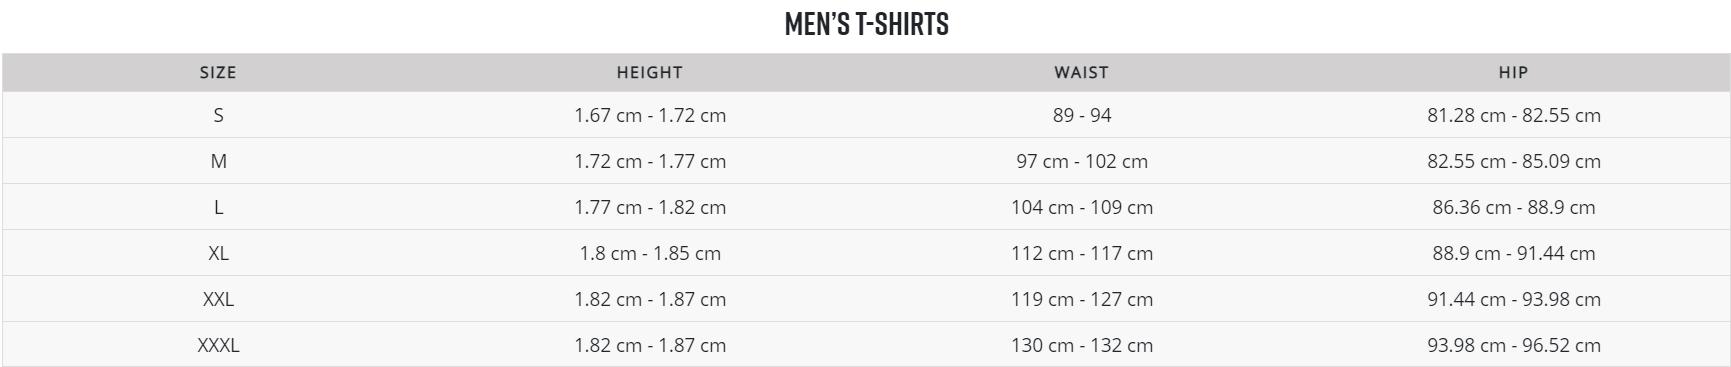 camisetas basicas fox t shirts